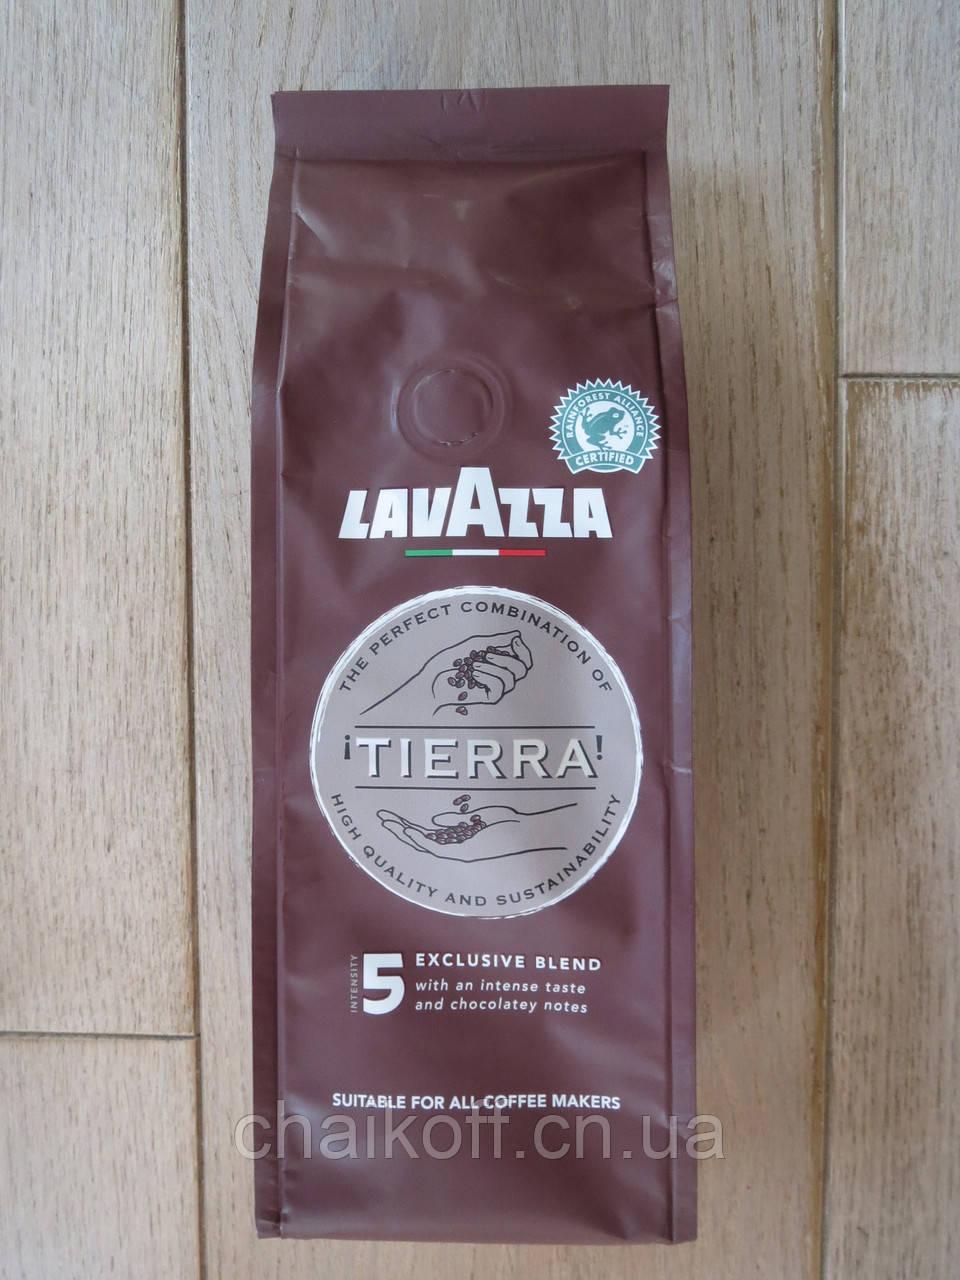 Кофе Lavazza Tierra 250 г молотый # 5